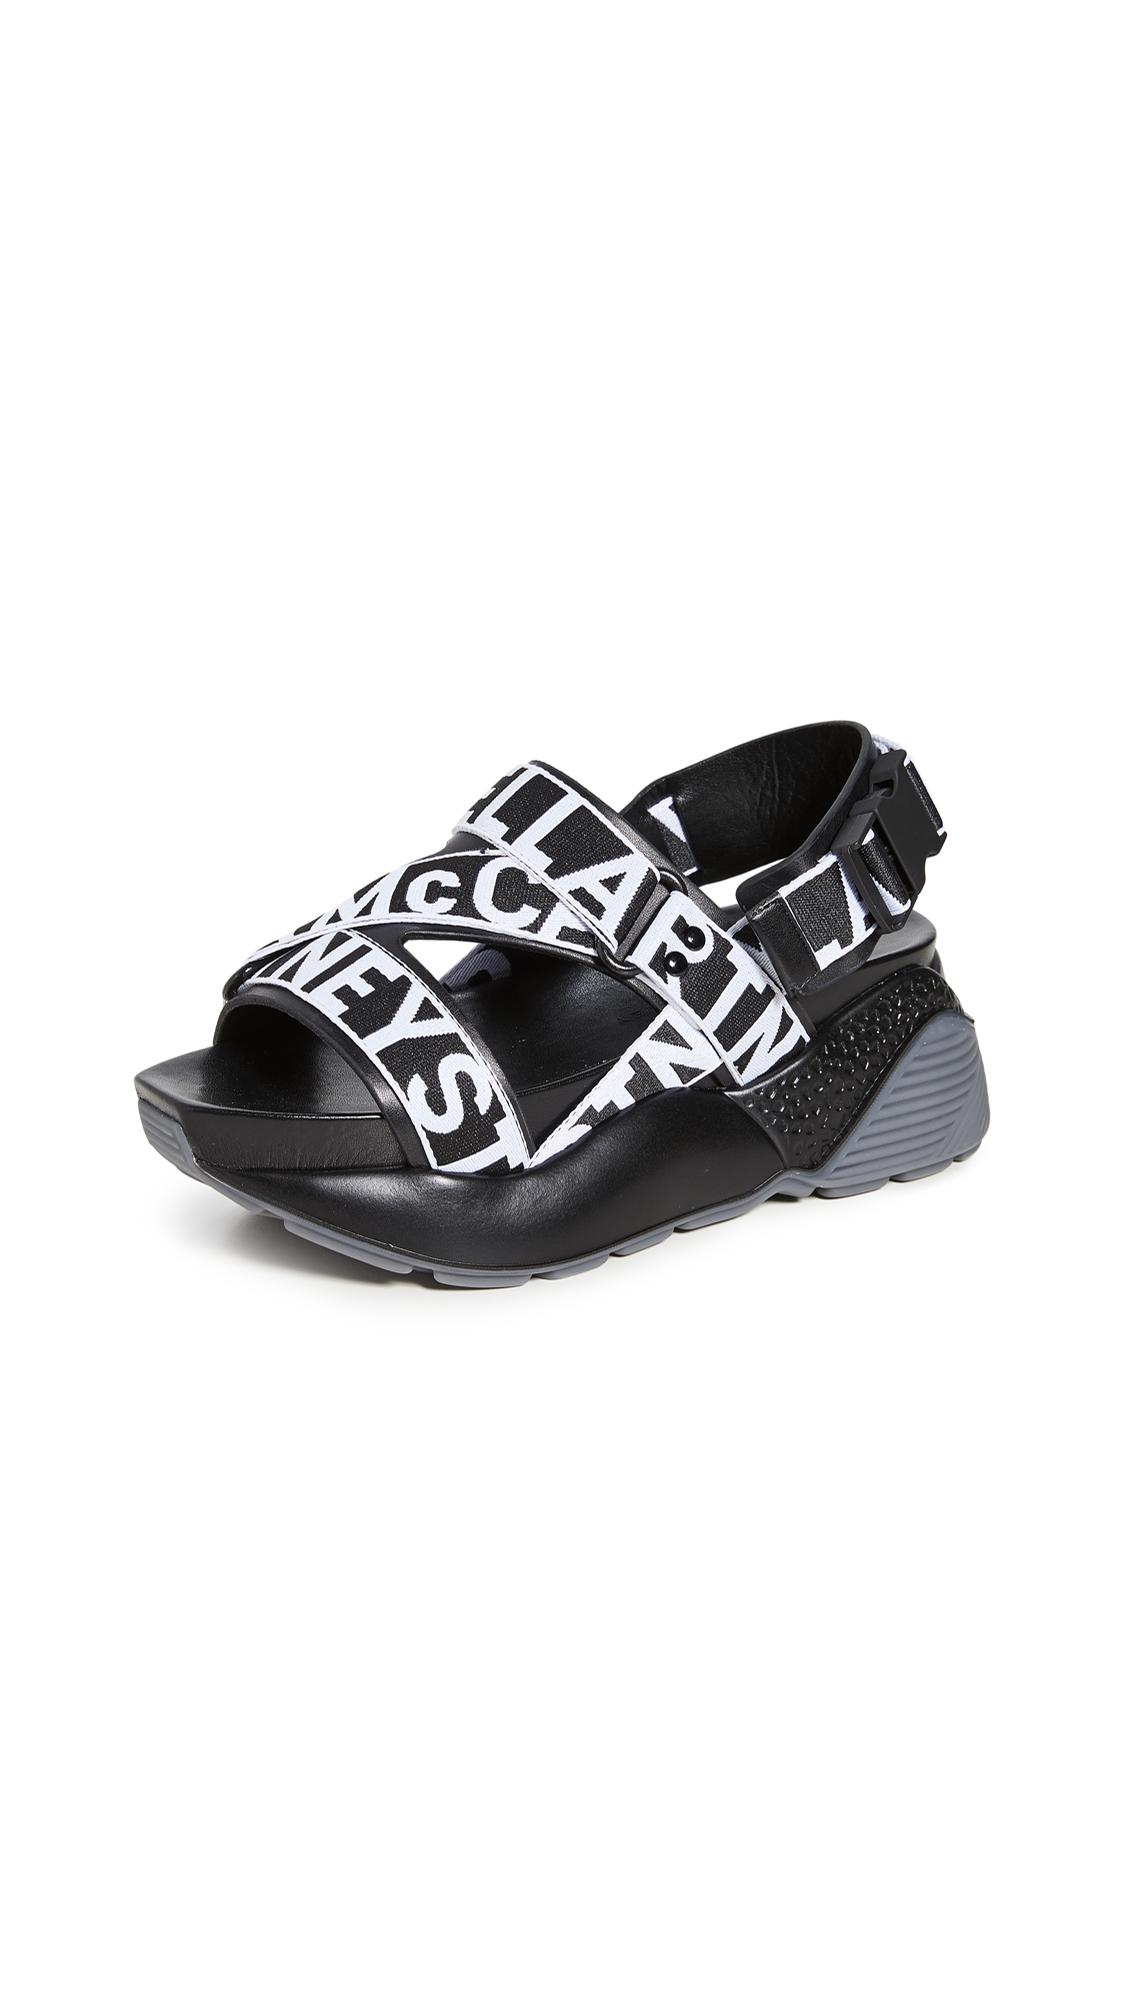 Stella McCartney Eclypse Sandals - 40% Off Sale